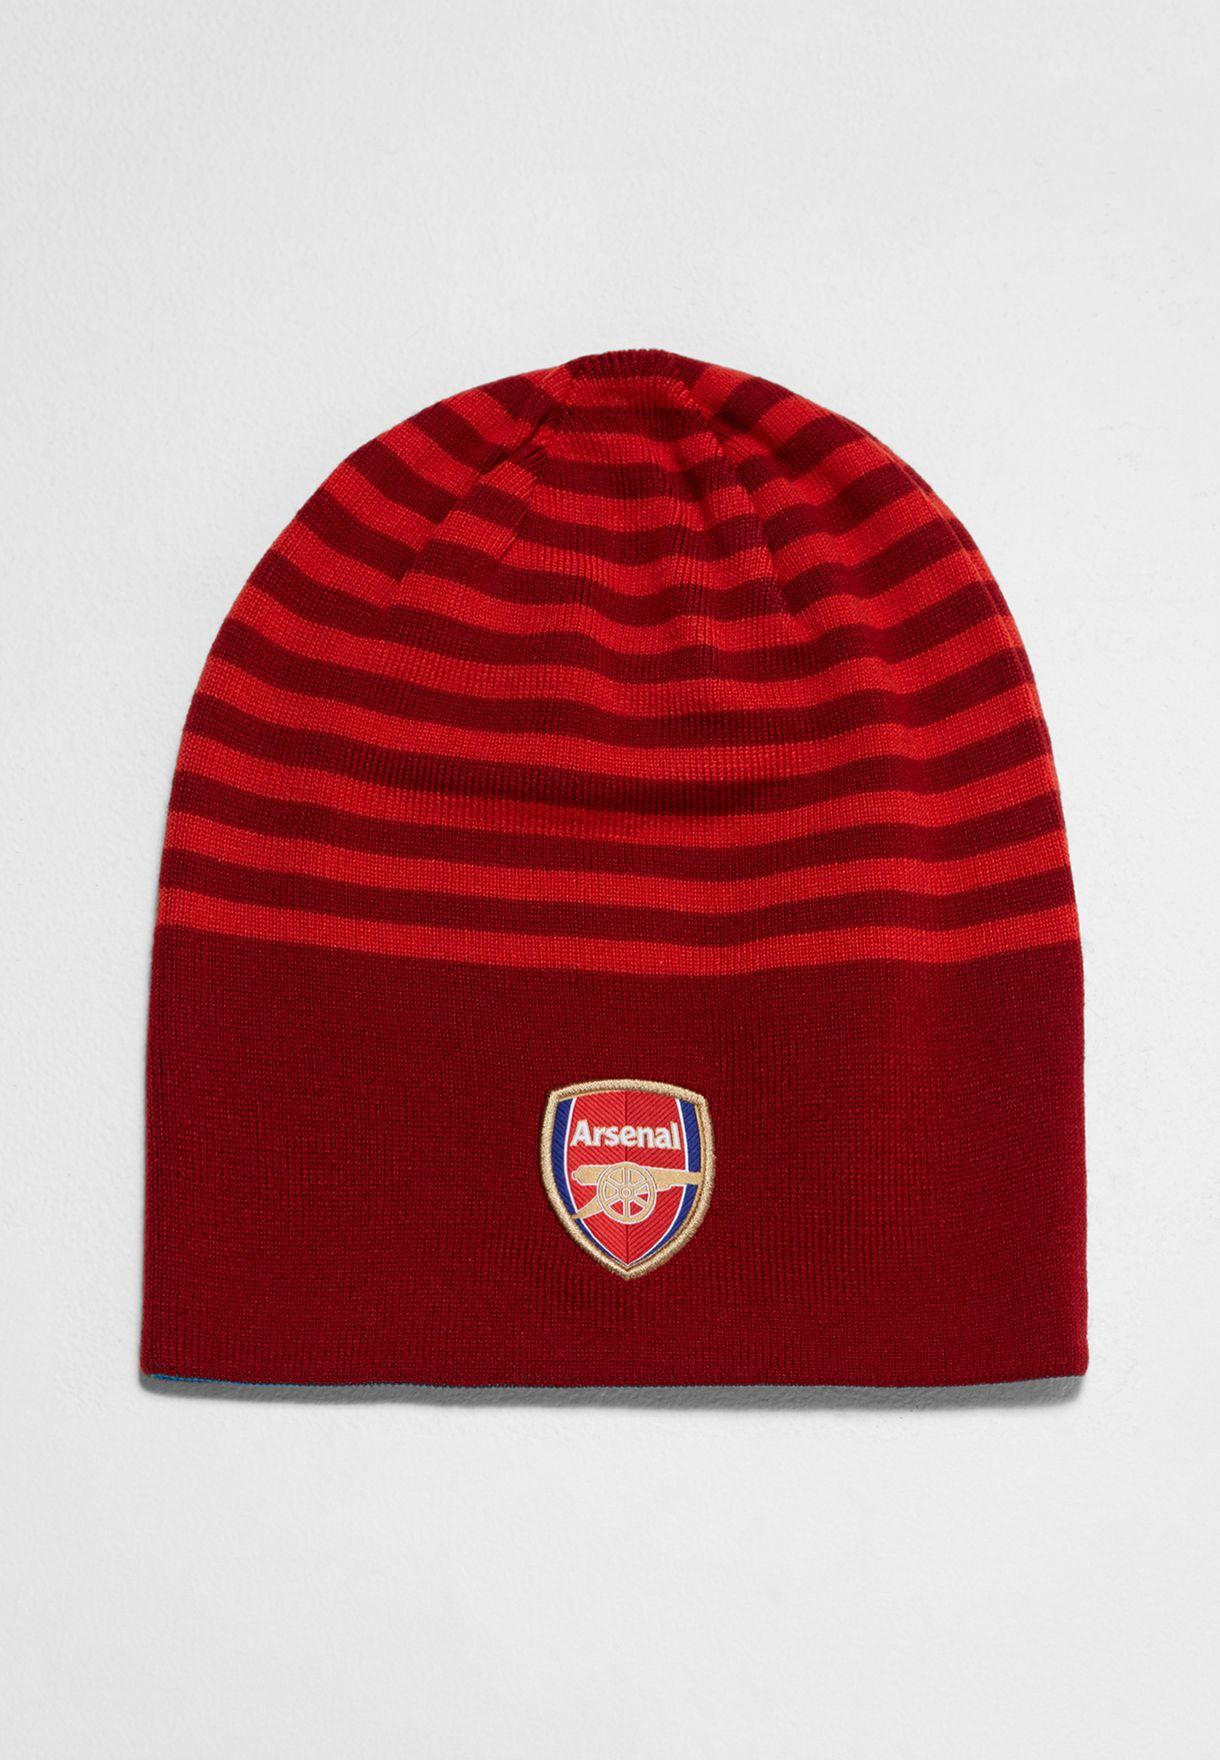 2415989eb1e ... france arsenal reversible beanie 1a91e 2211a sale puma arsenal red black  110 adjustable snapback hat ...